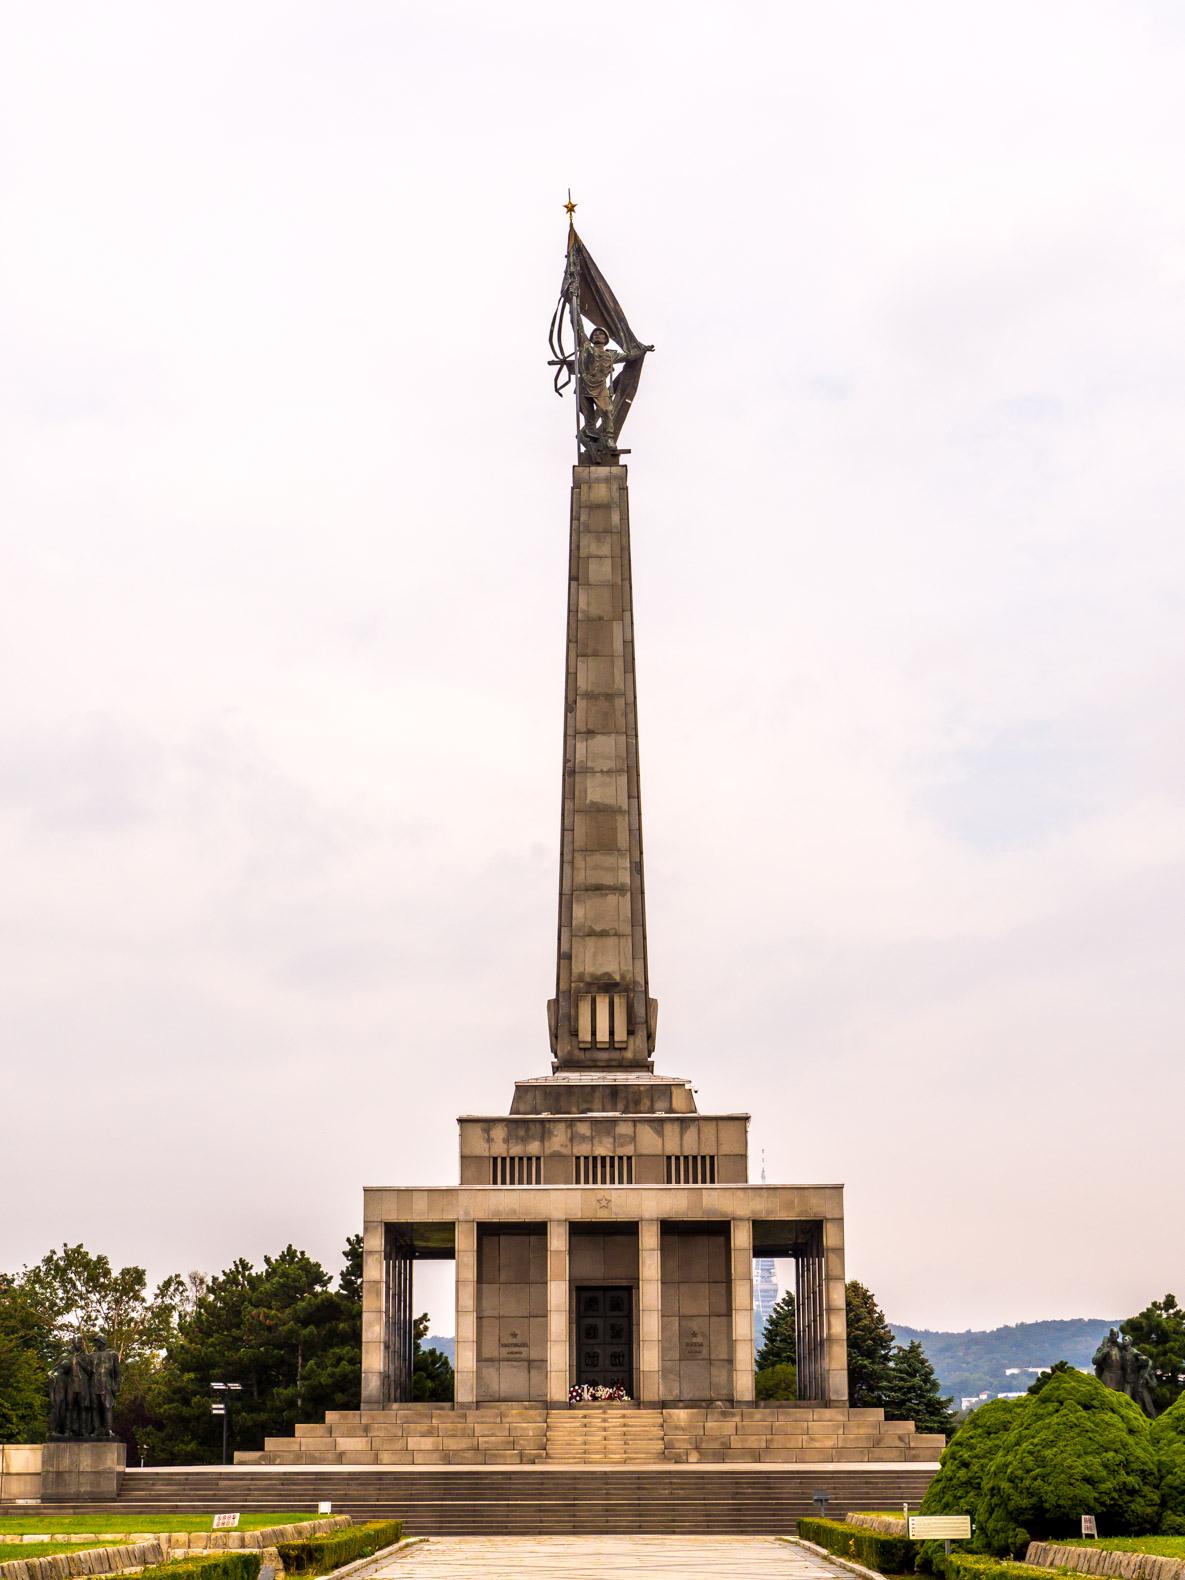 Bratislava things to do: visit the Slavin Memorial